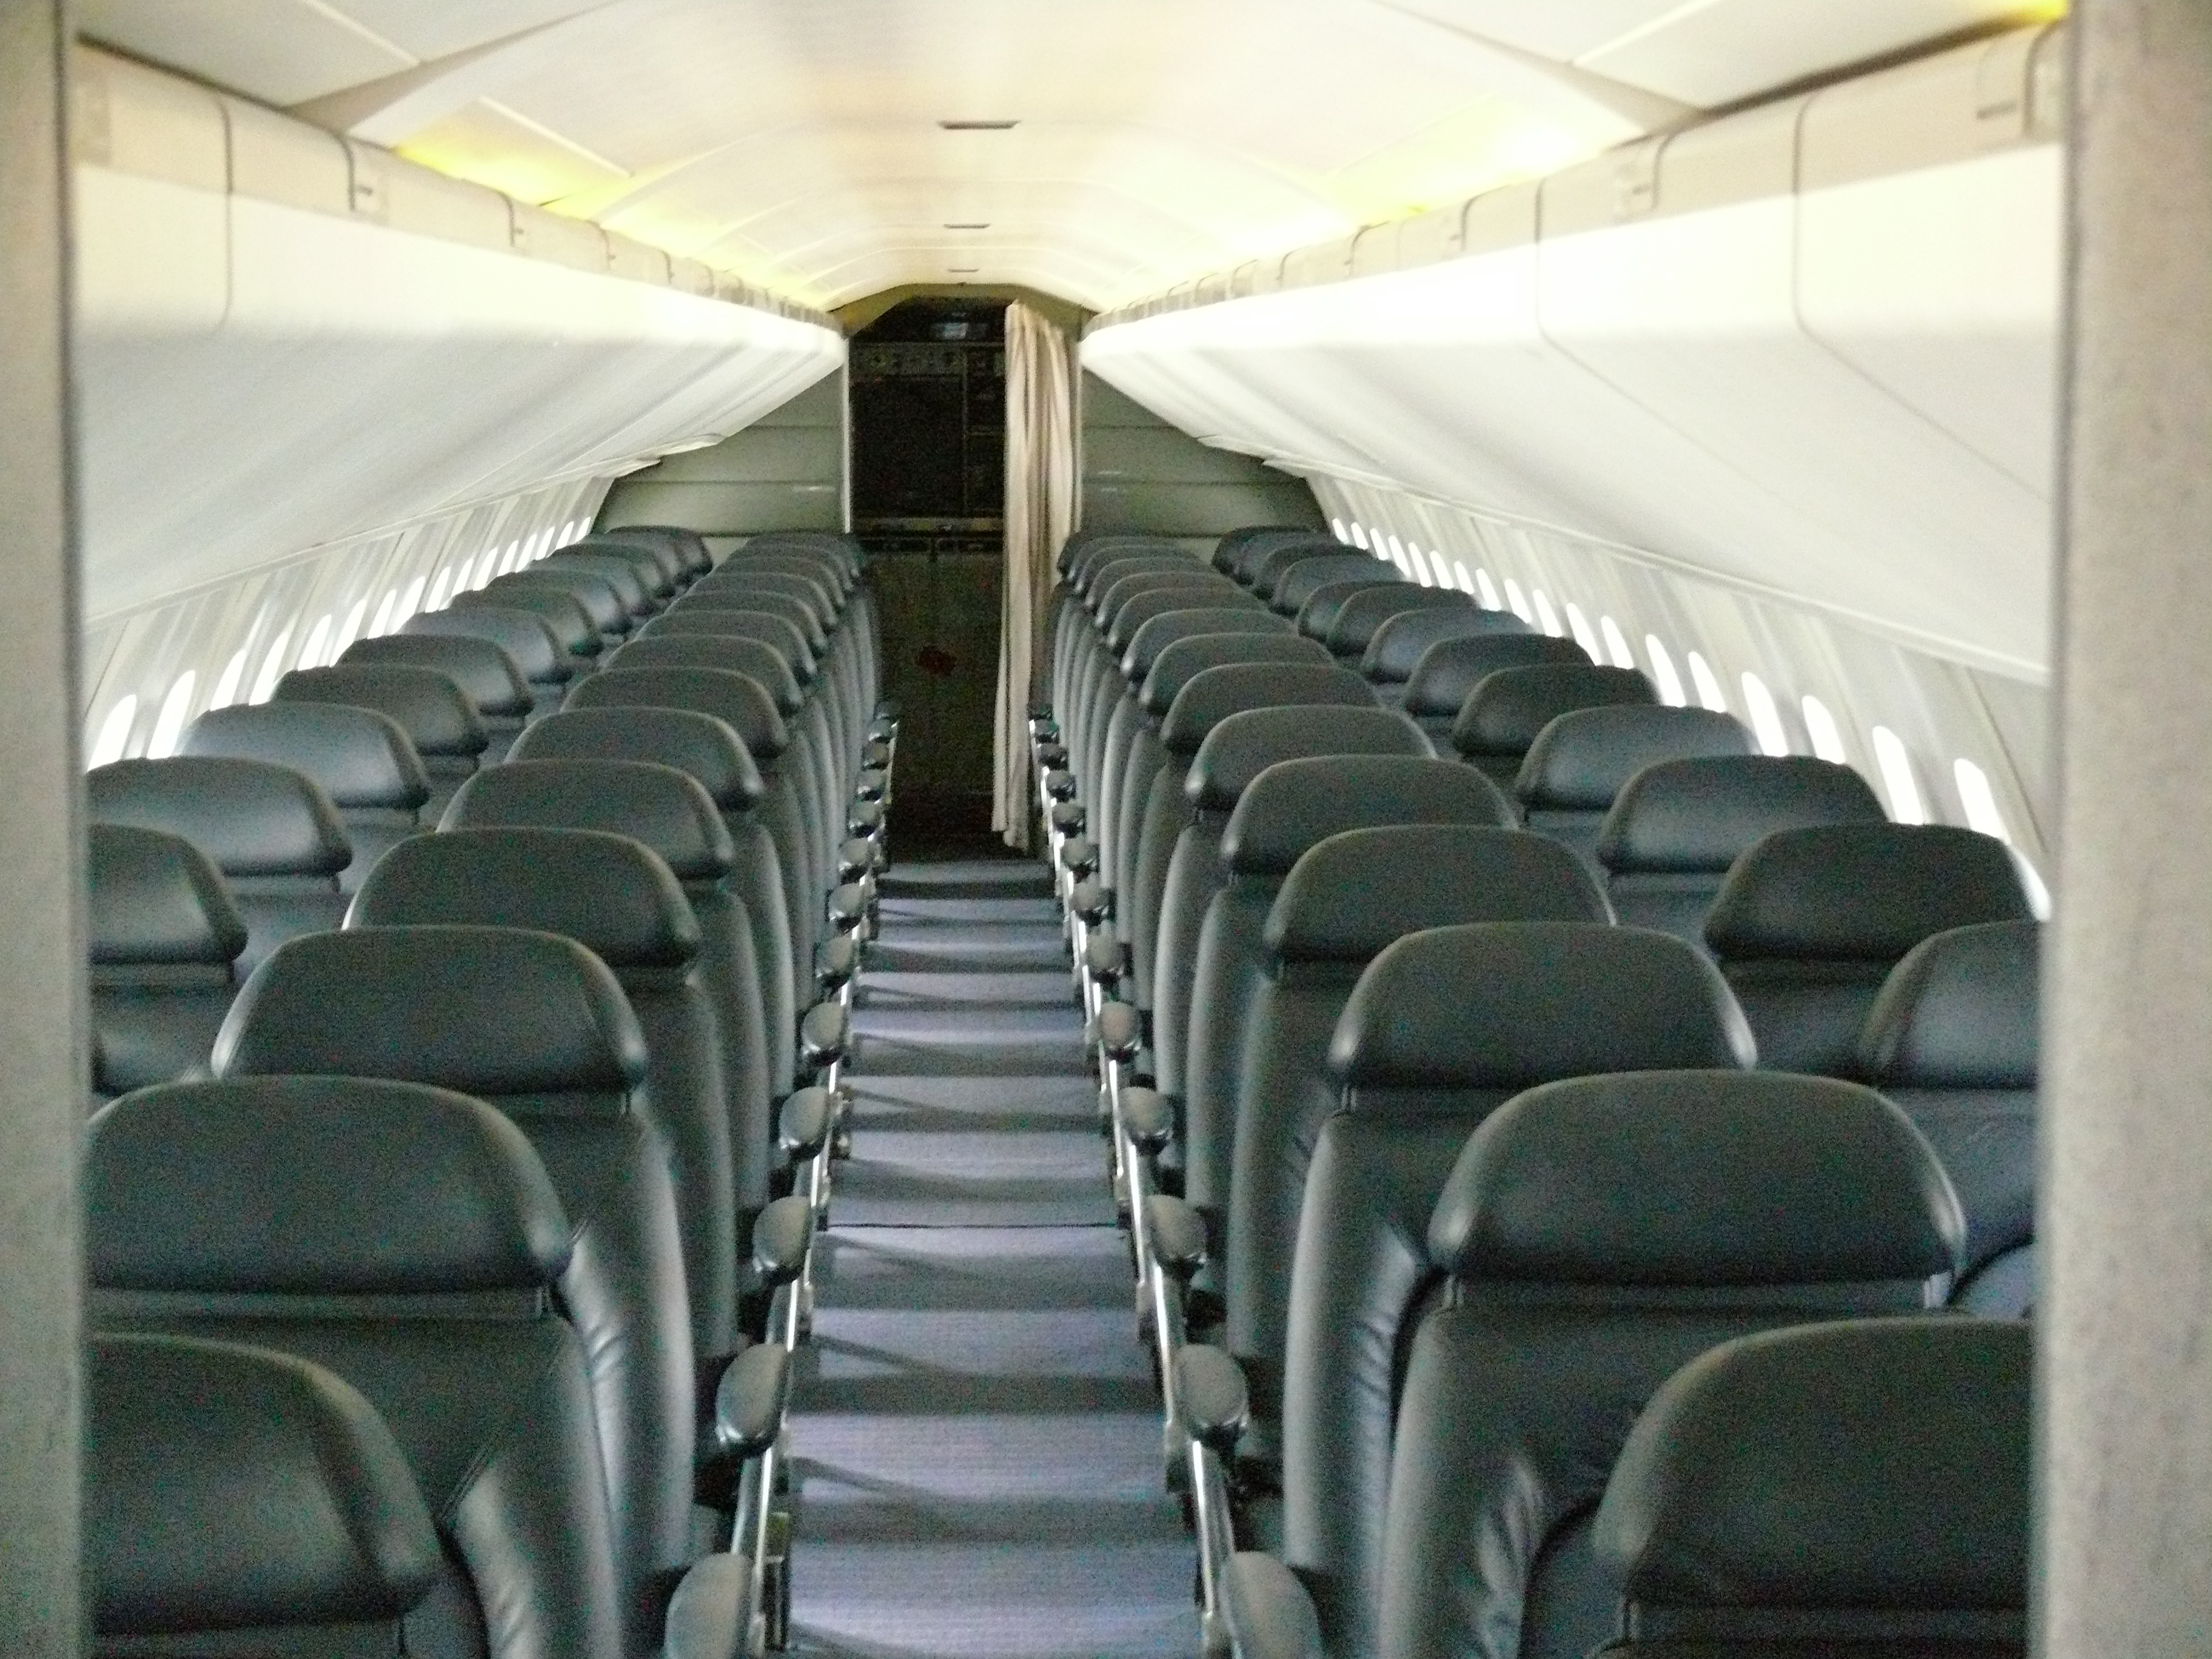 File:Concorde Interior 01.JPG